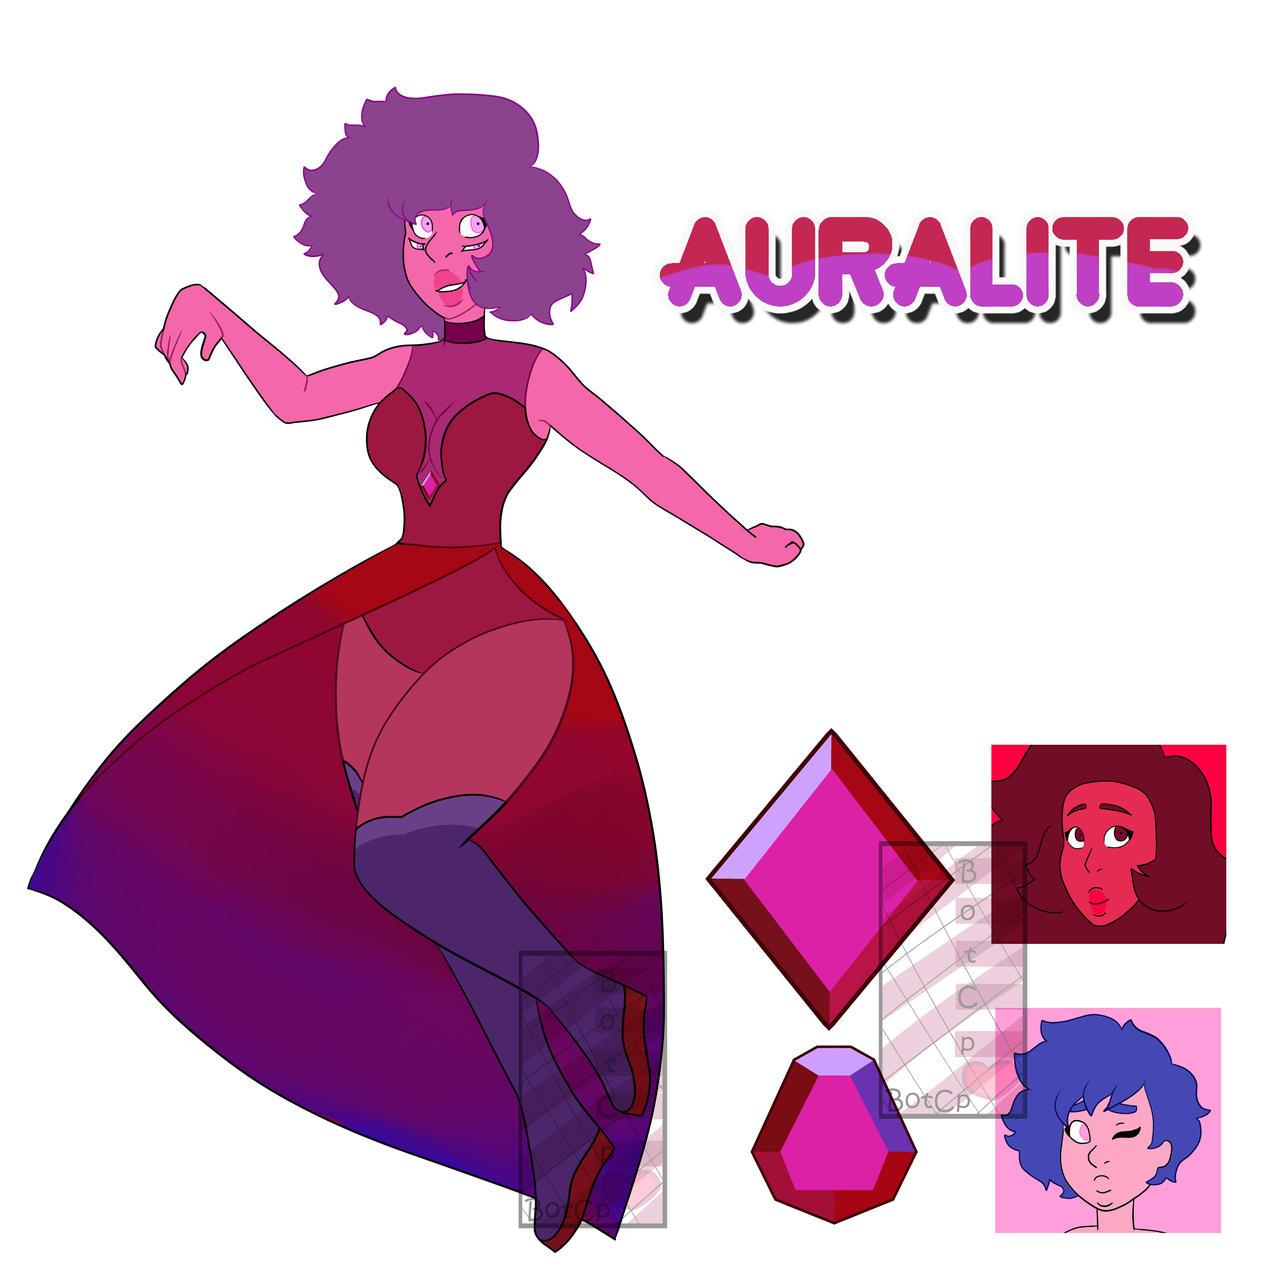 Auralite by BotCp